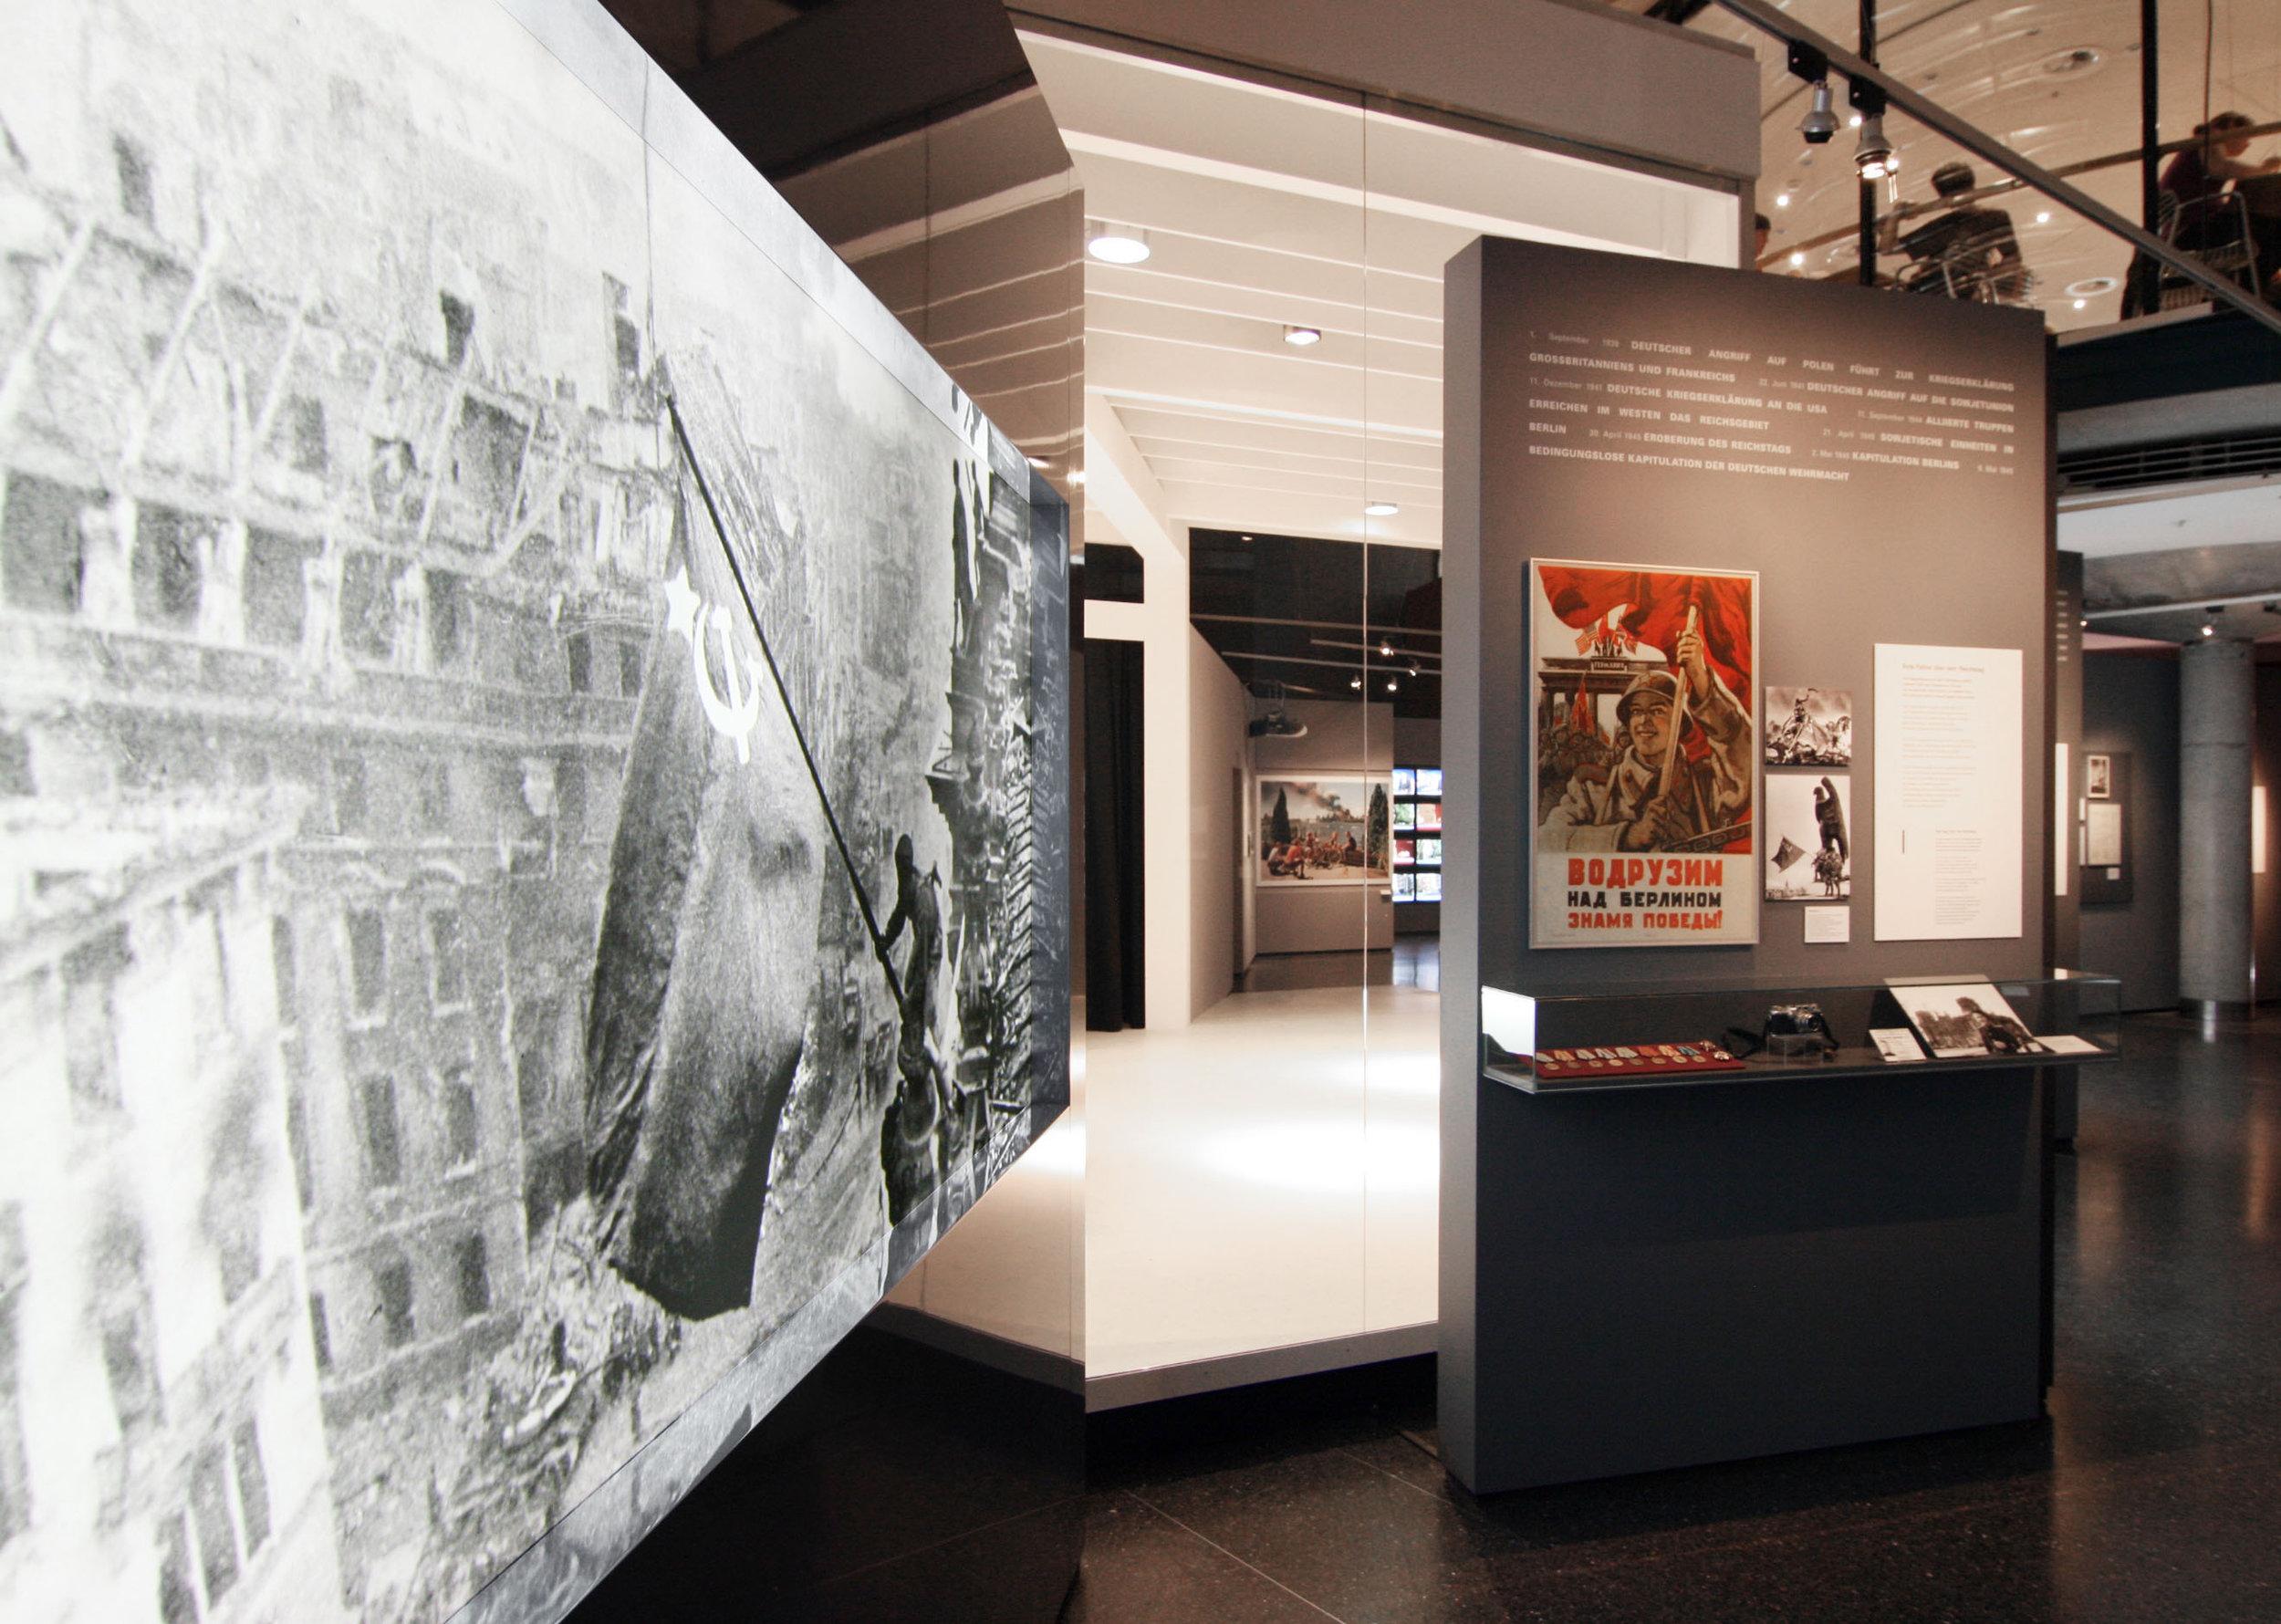 bilder-im-kopf_museum-exhibition-design_coordination-berlin_02.jpg